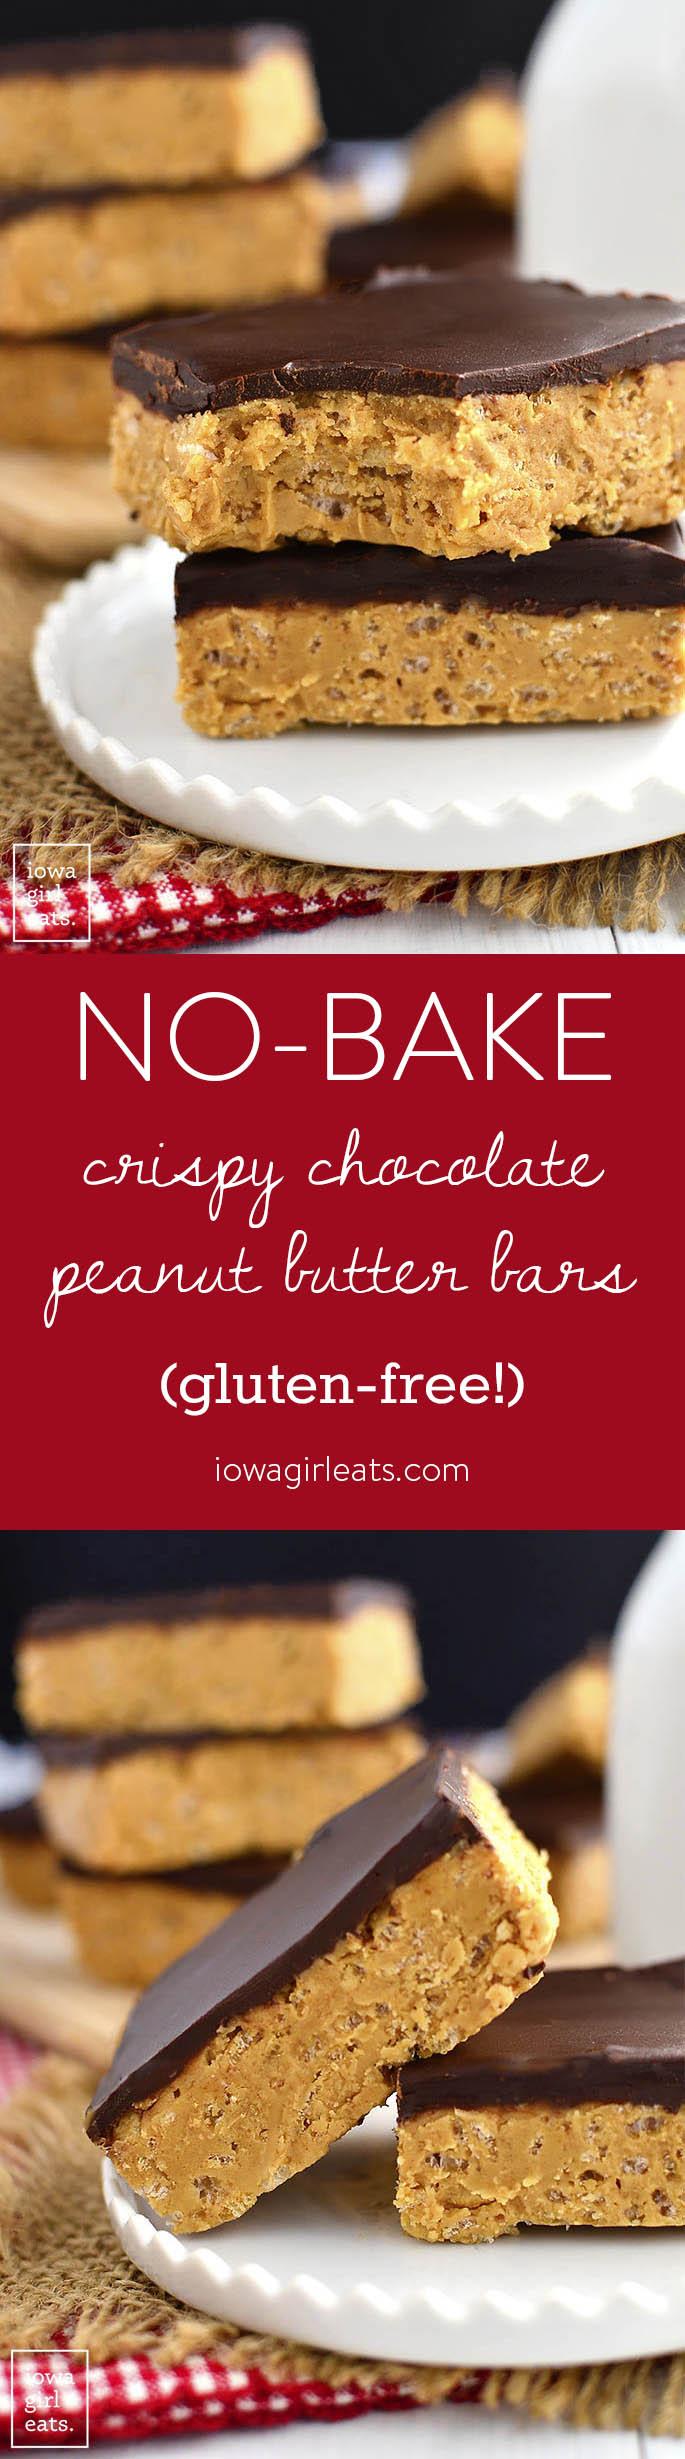 No-Bake Crispy Chocolate Peanut Butter Bars are a 5-ingredient dairy-free, gluten-free dessert recipe that taste like a crispy Reese's Peanut Butter Cup! | iowagirleats.com